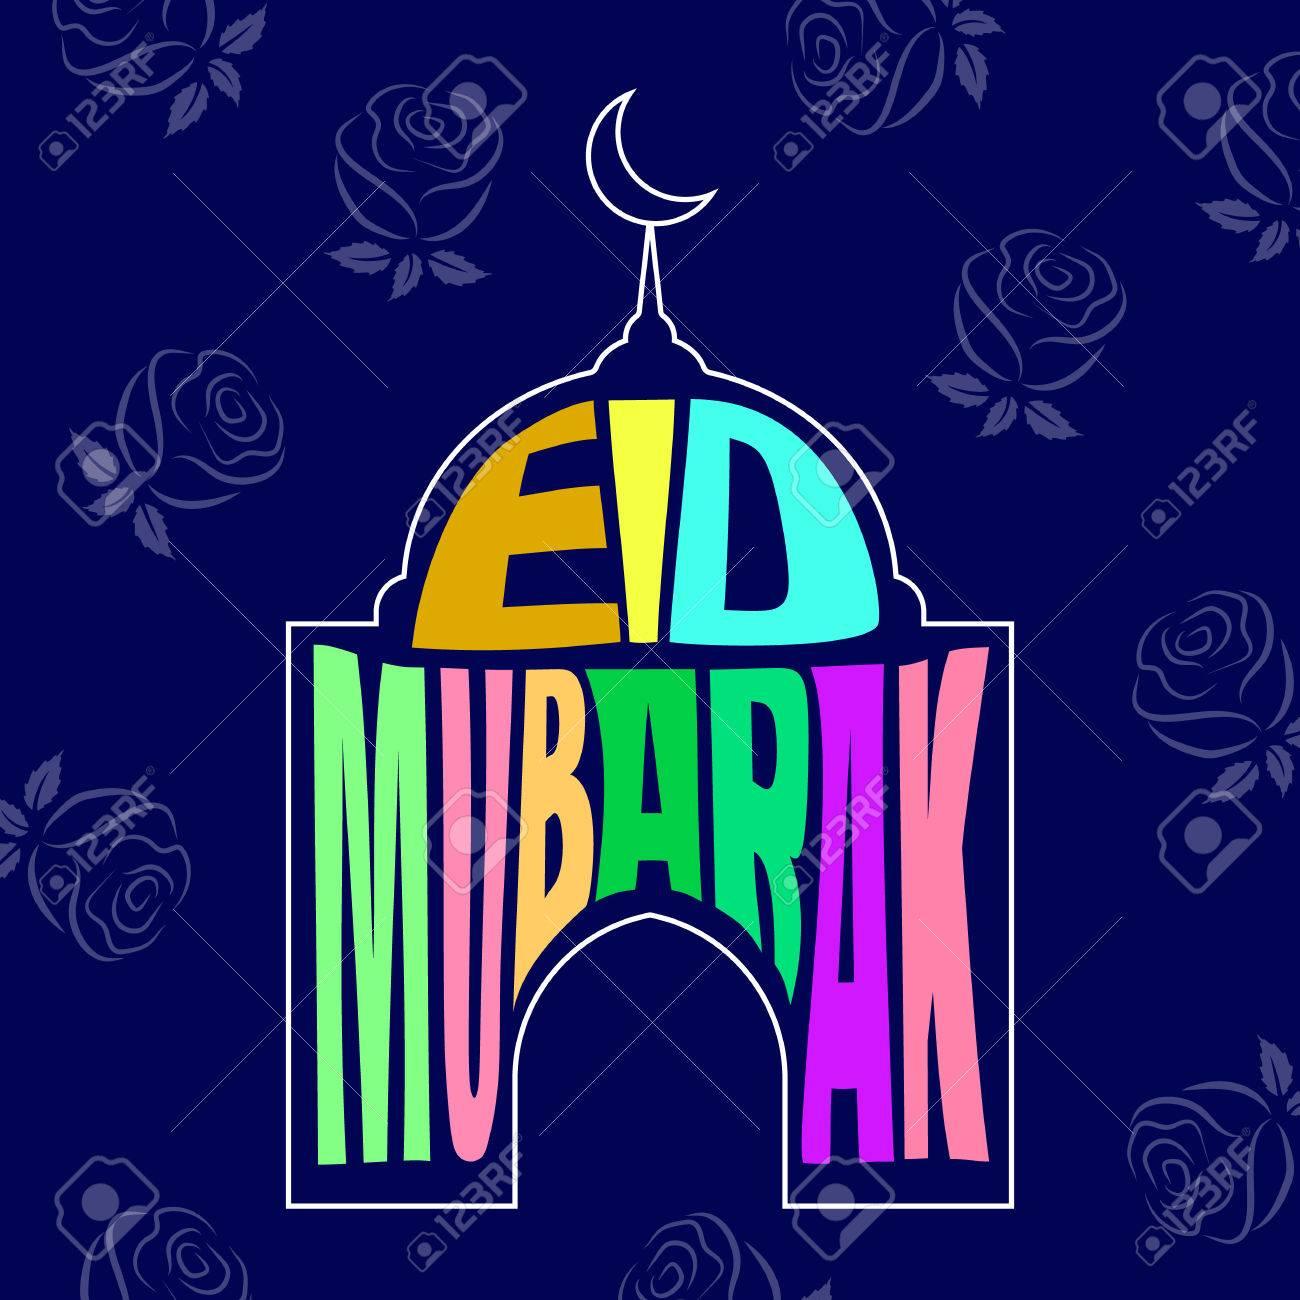 Vector Illustration With Eid Al Adha Mubarak Greeting Card